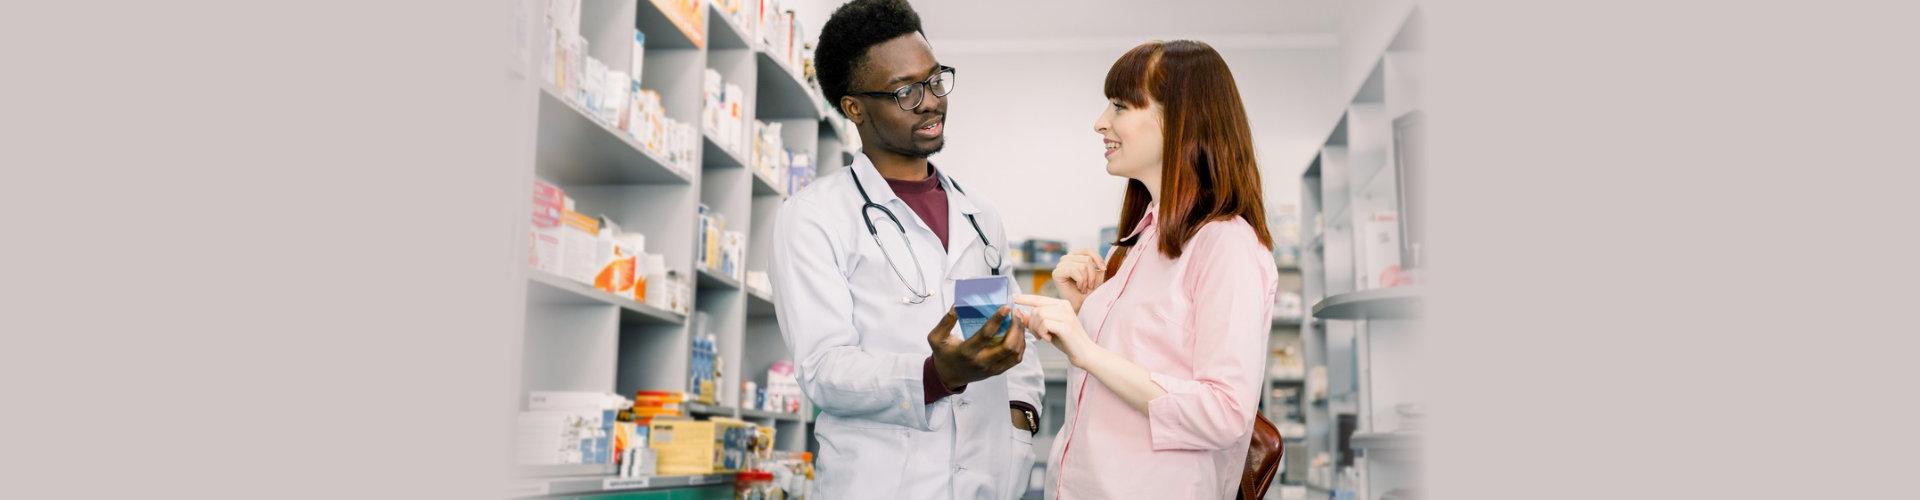 Customer asking to Doctor